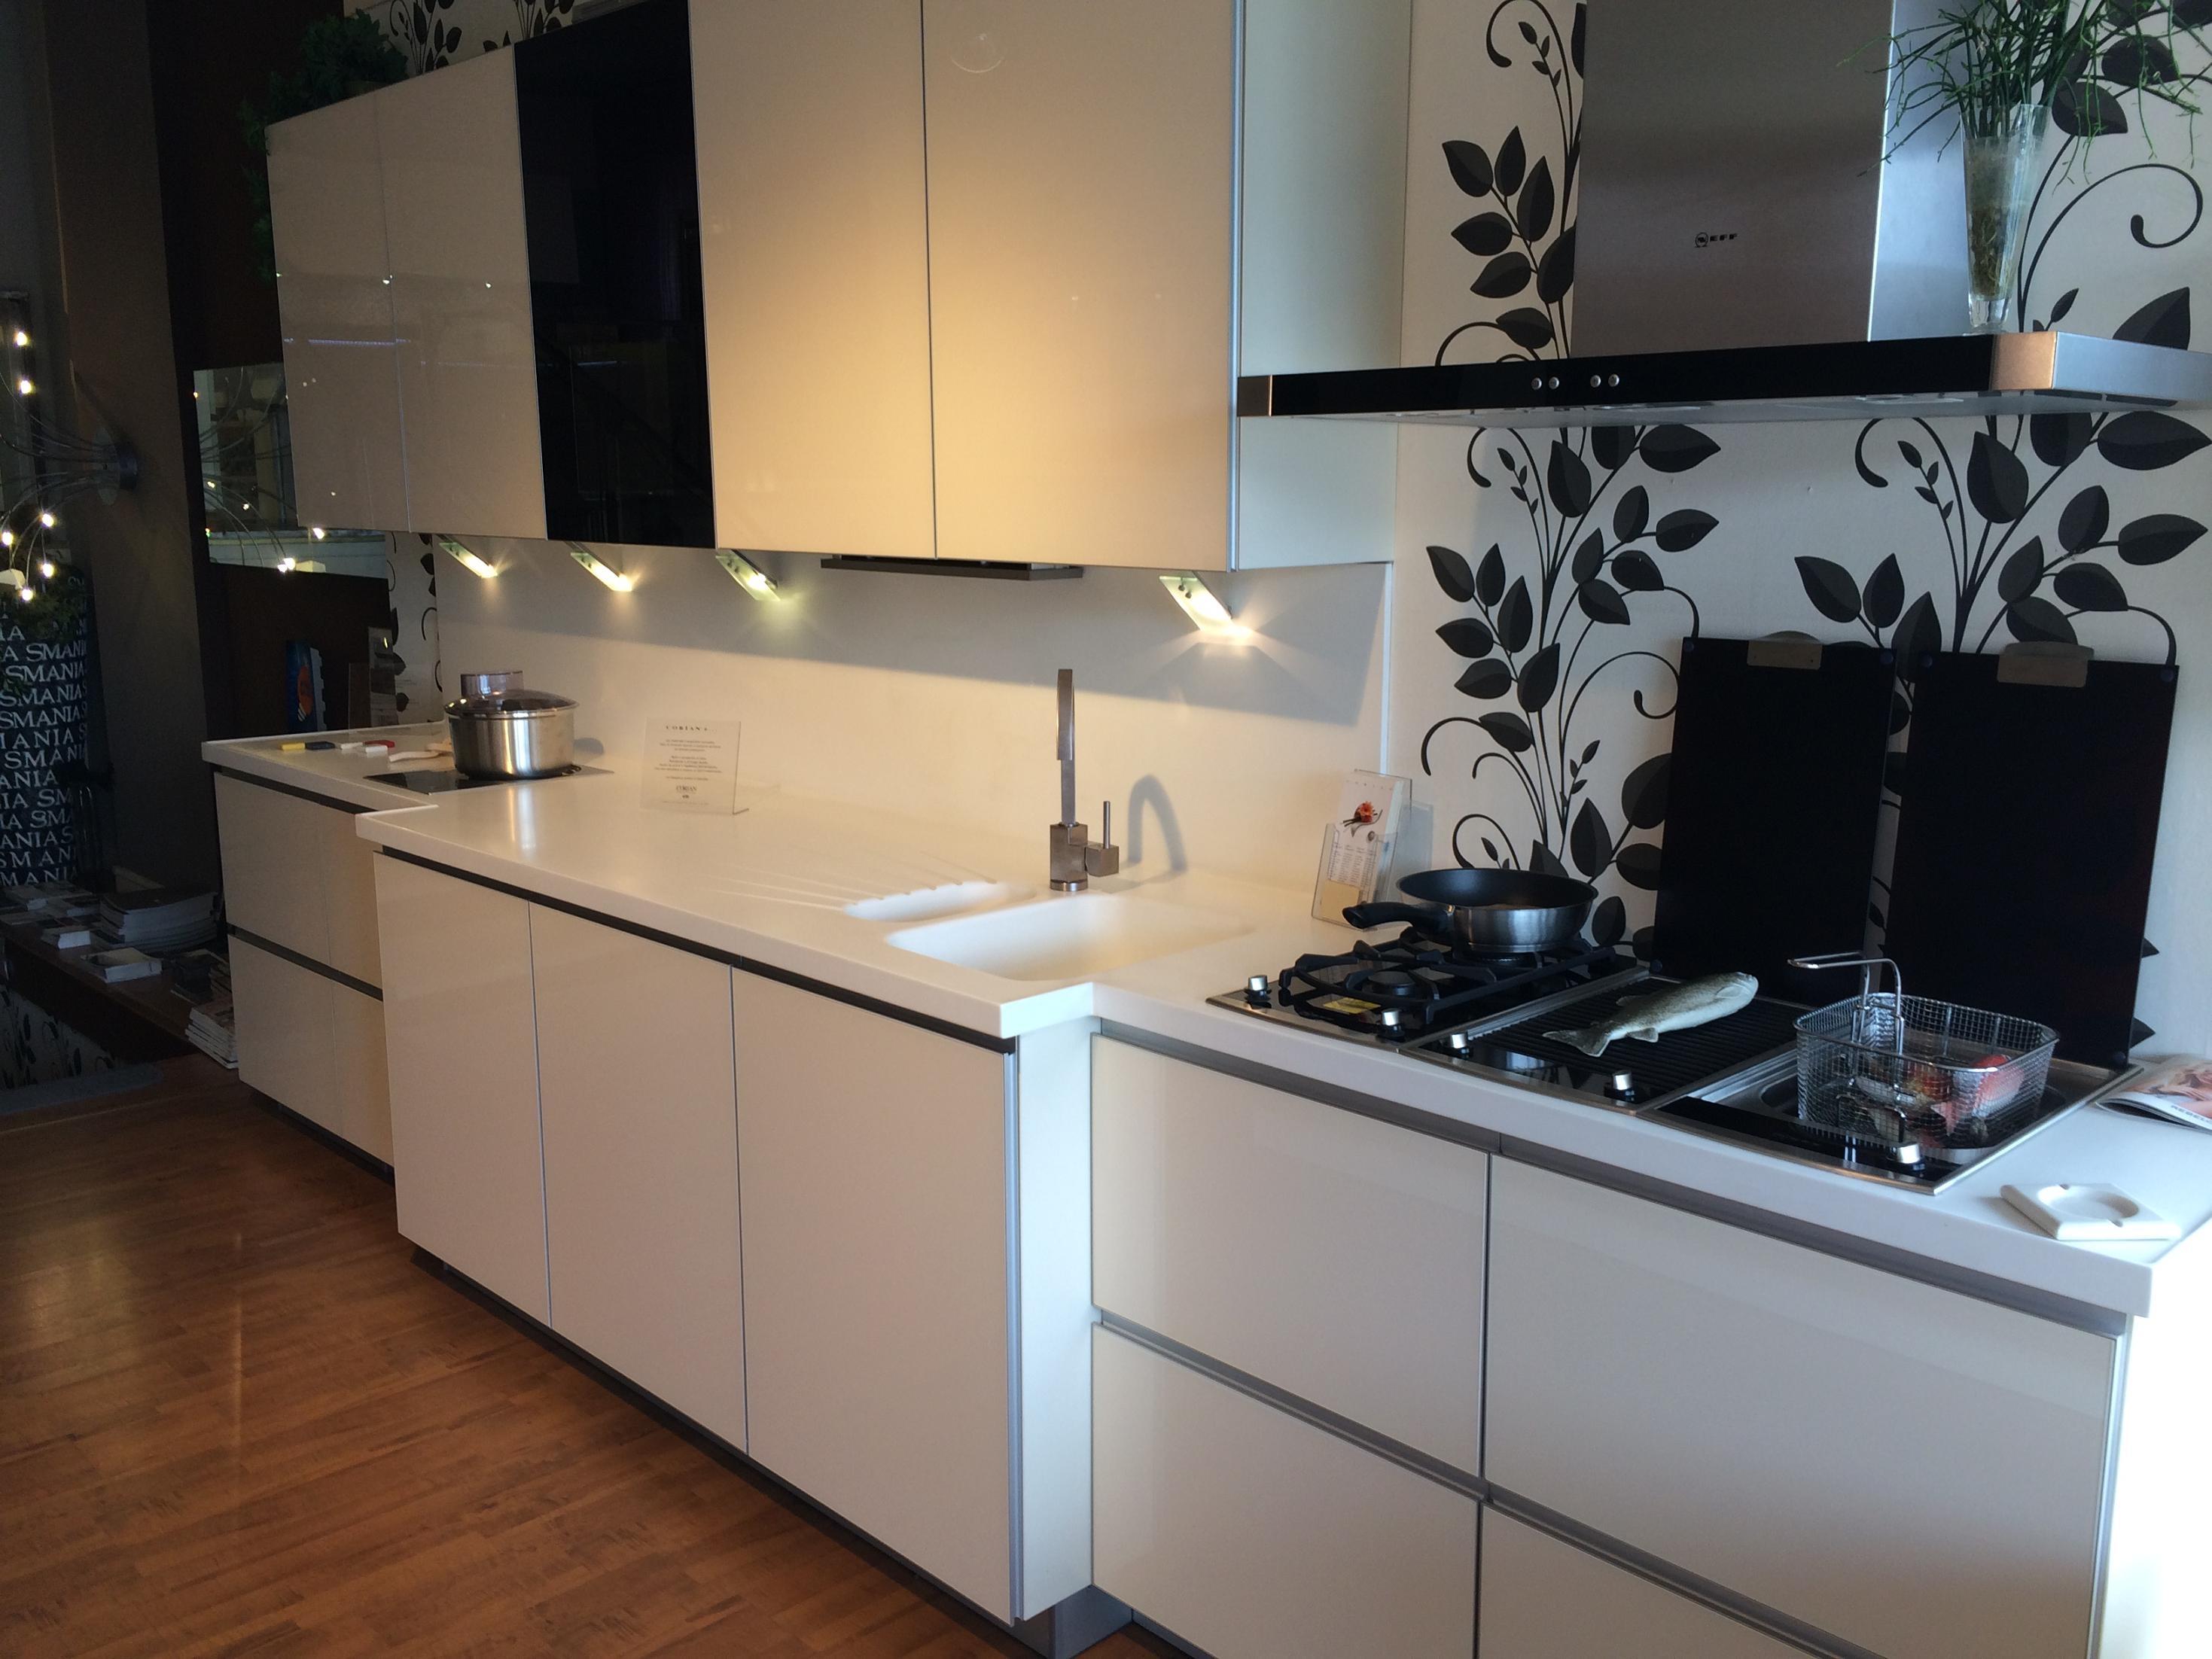 Cucina alno art pro vetro in offerta cucine a prezzi - Top cucina in vetro ...